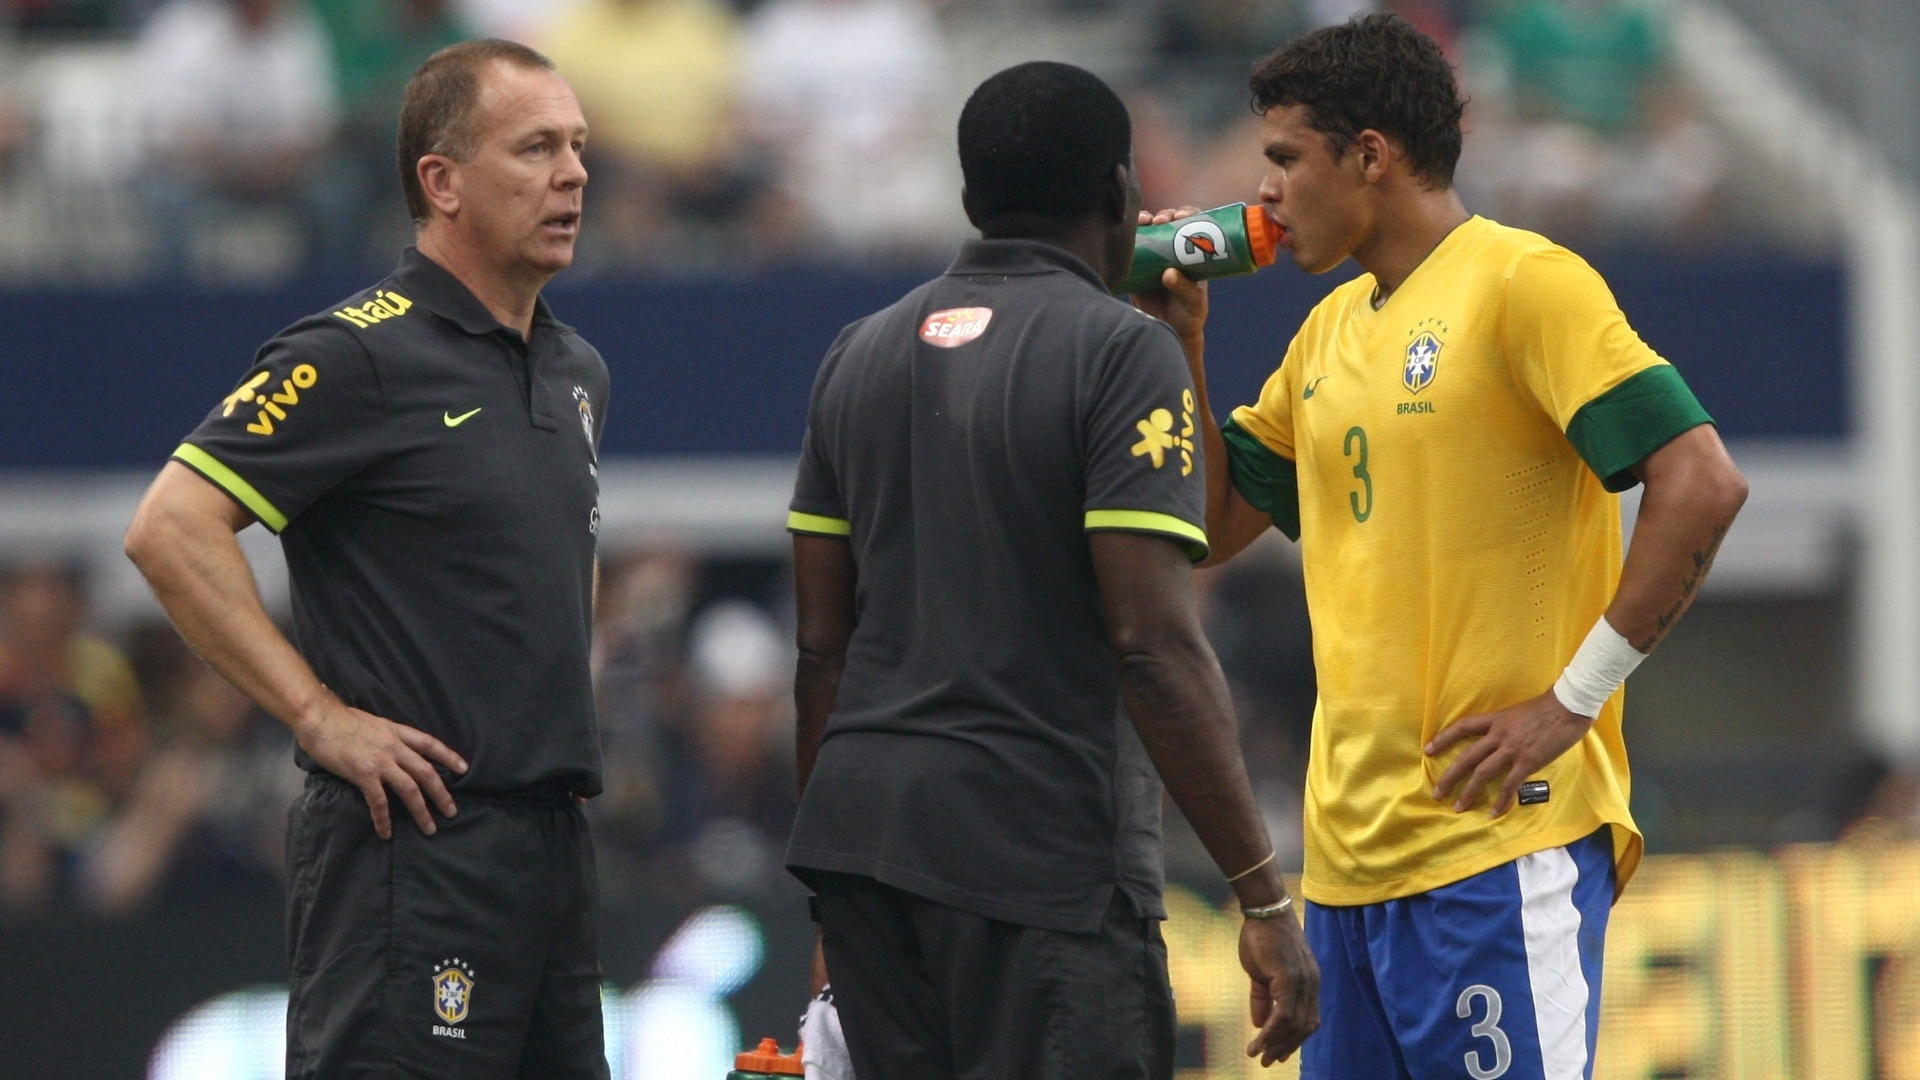 Mano Menezes orienta Thiago Silva no jogo contra o México. Zagueiro deixou a partida machucado